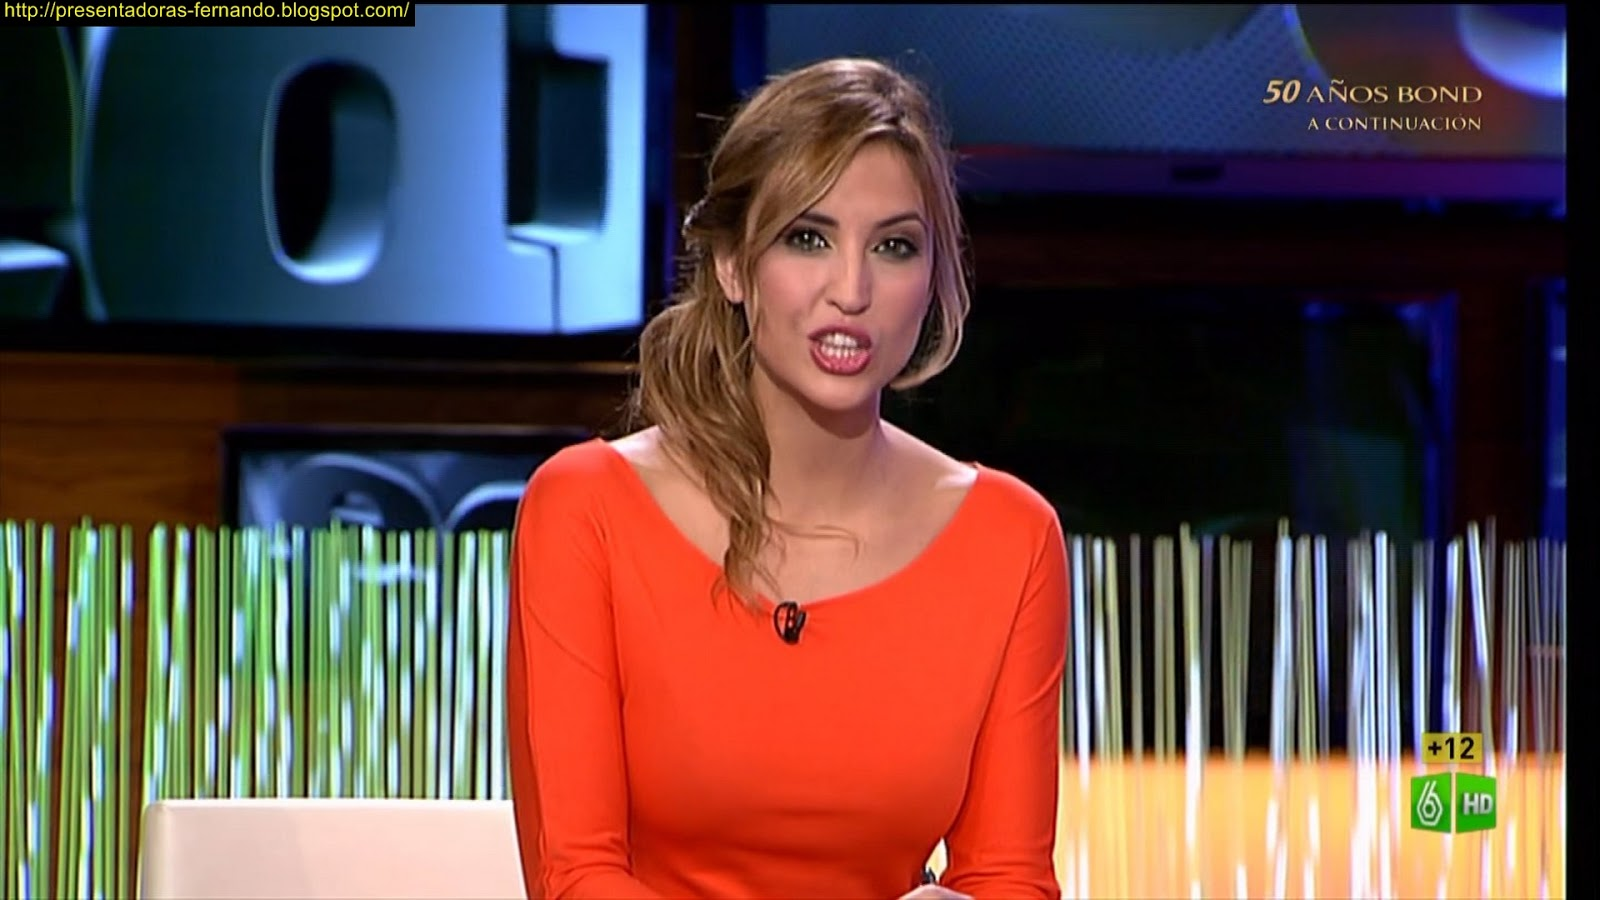 Sandra Sabates El Intermedio 6-11-2012